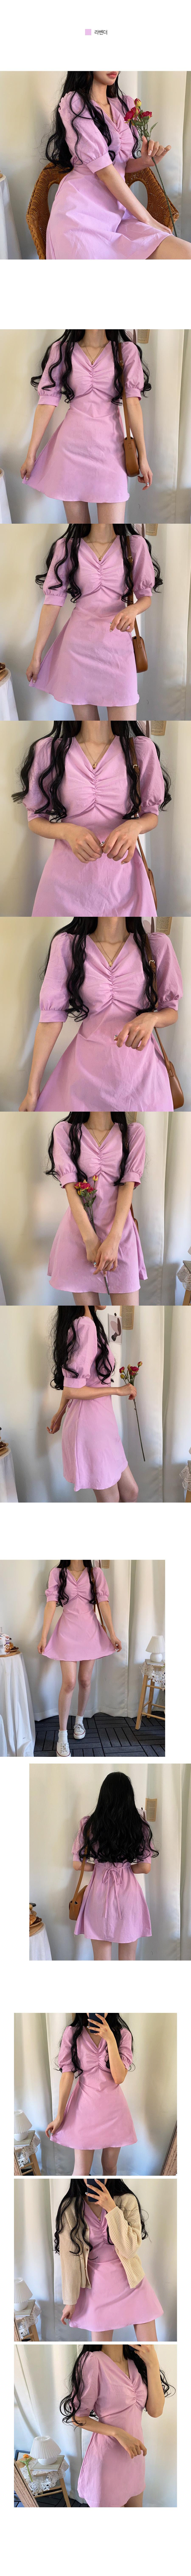 Lavender linen mini dress